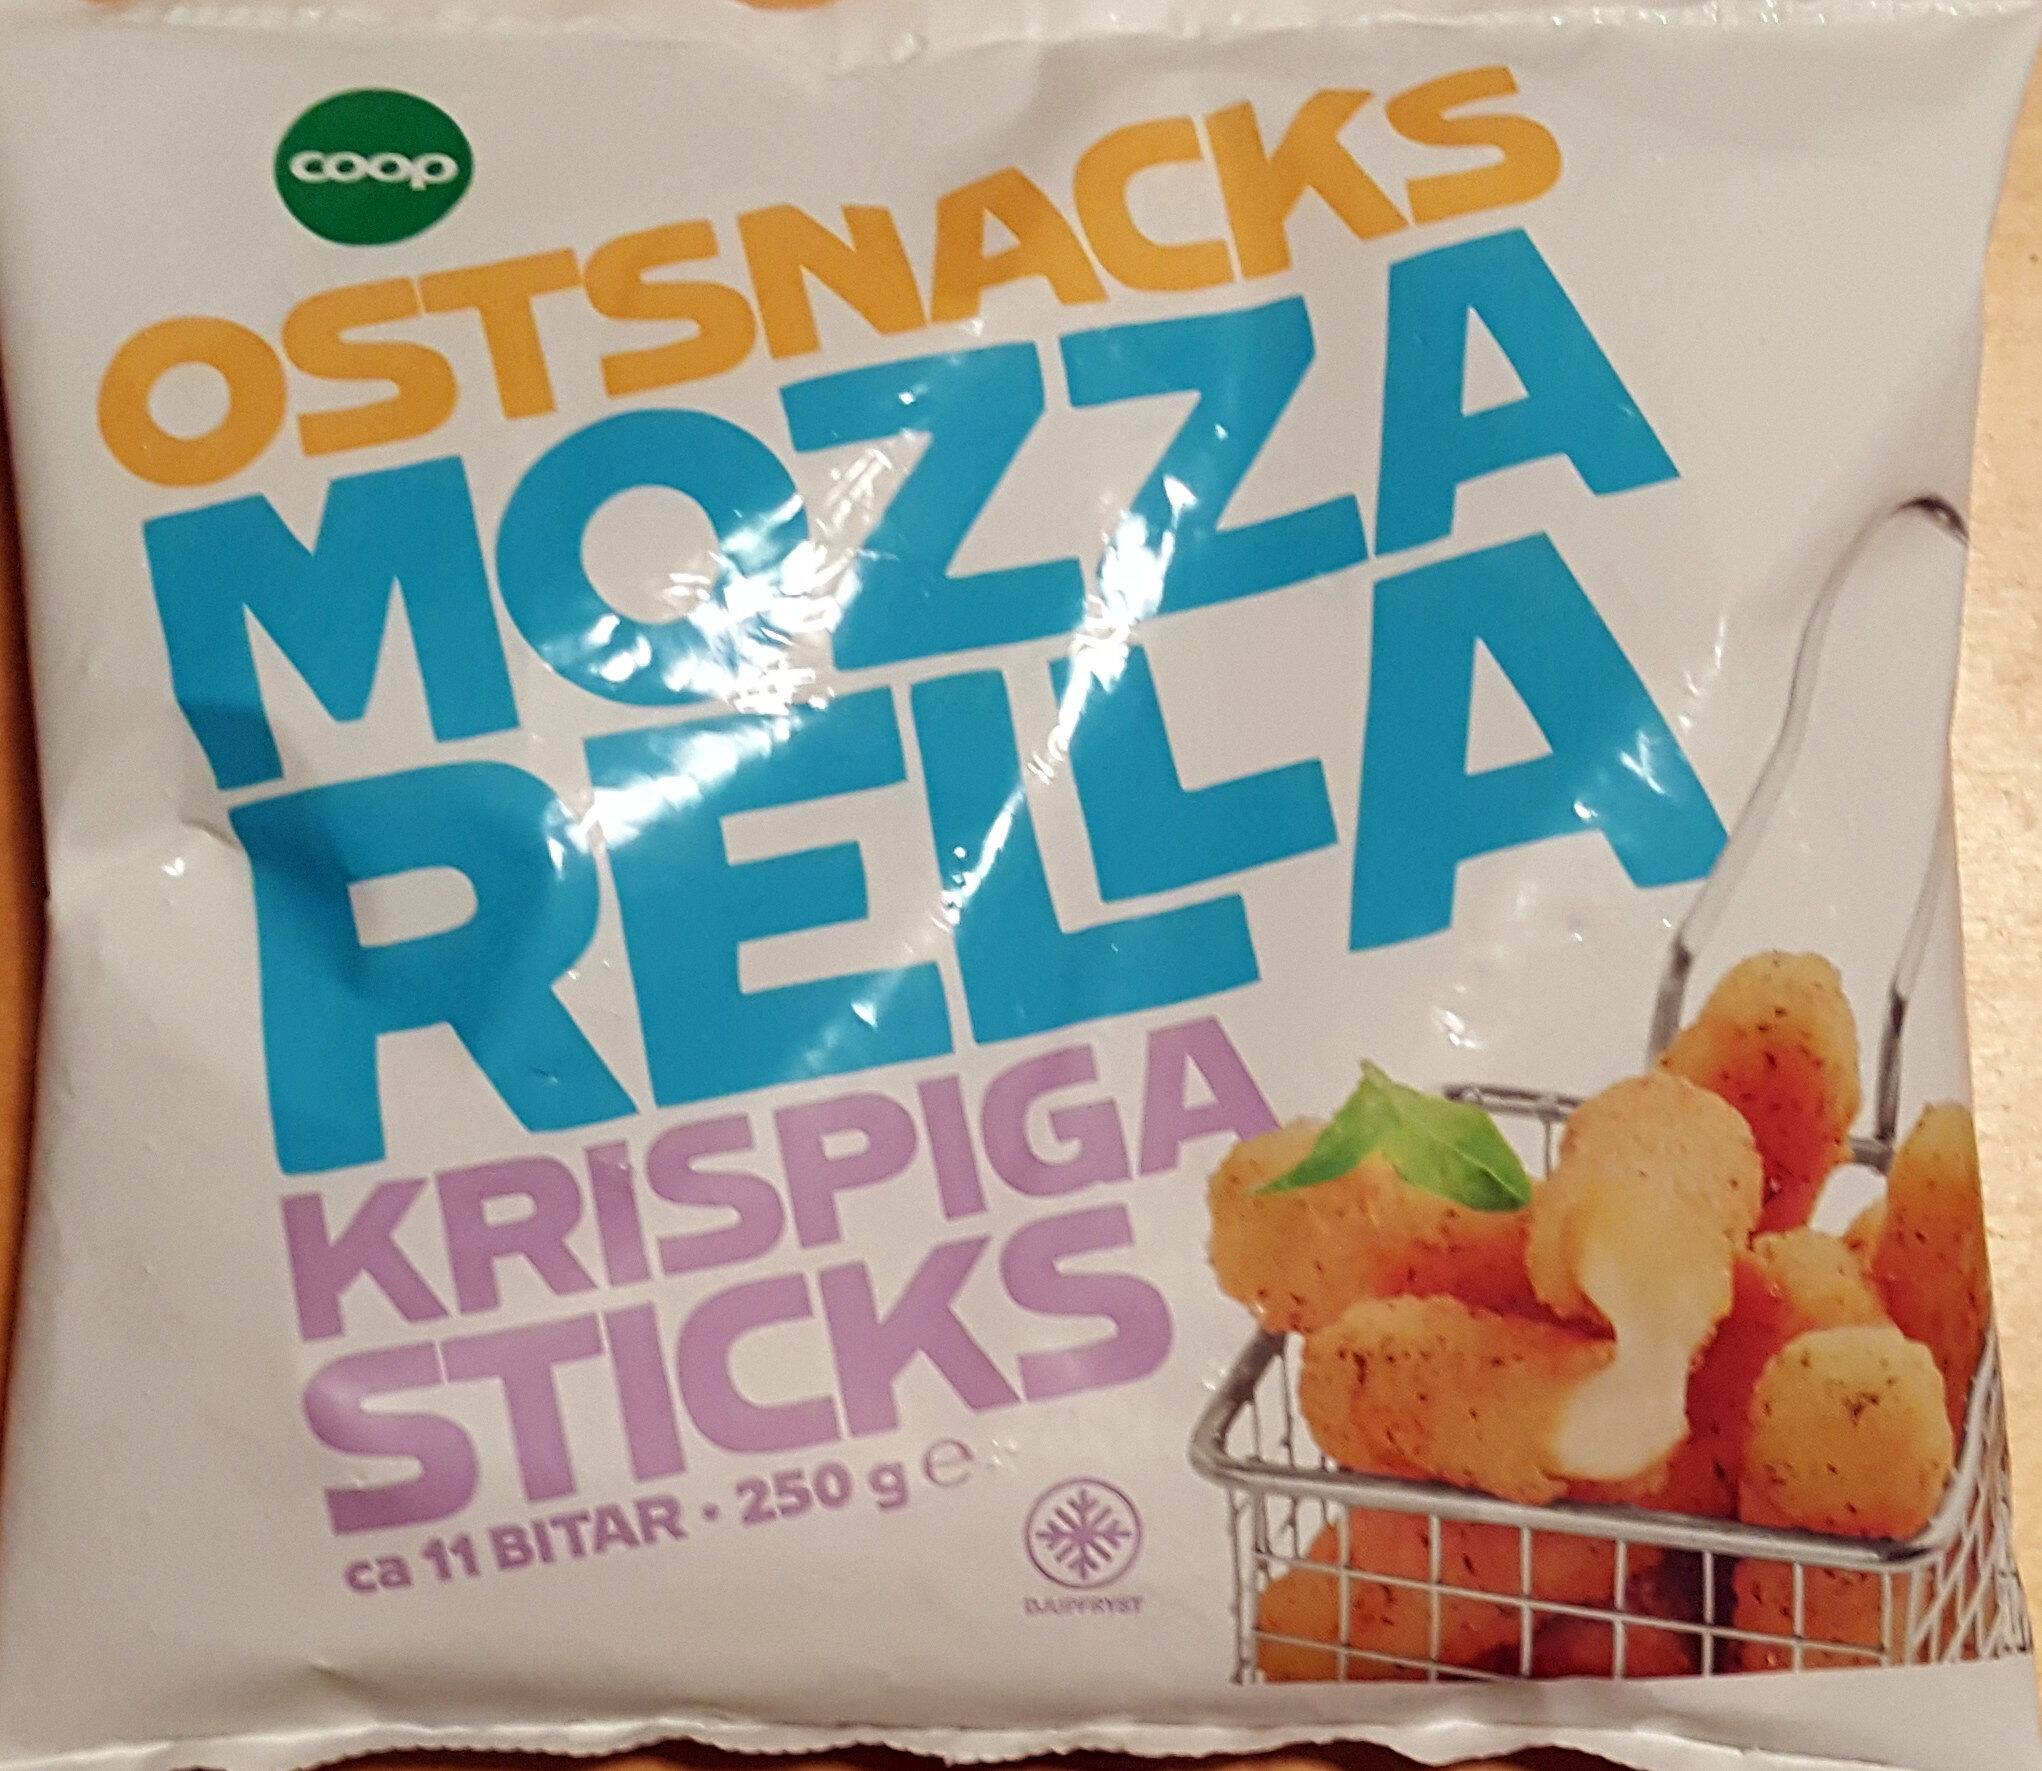 Ostsnacks Mozzarella Krispiga Snacks - Produit - sv